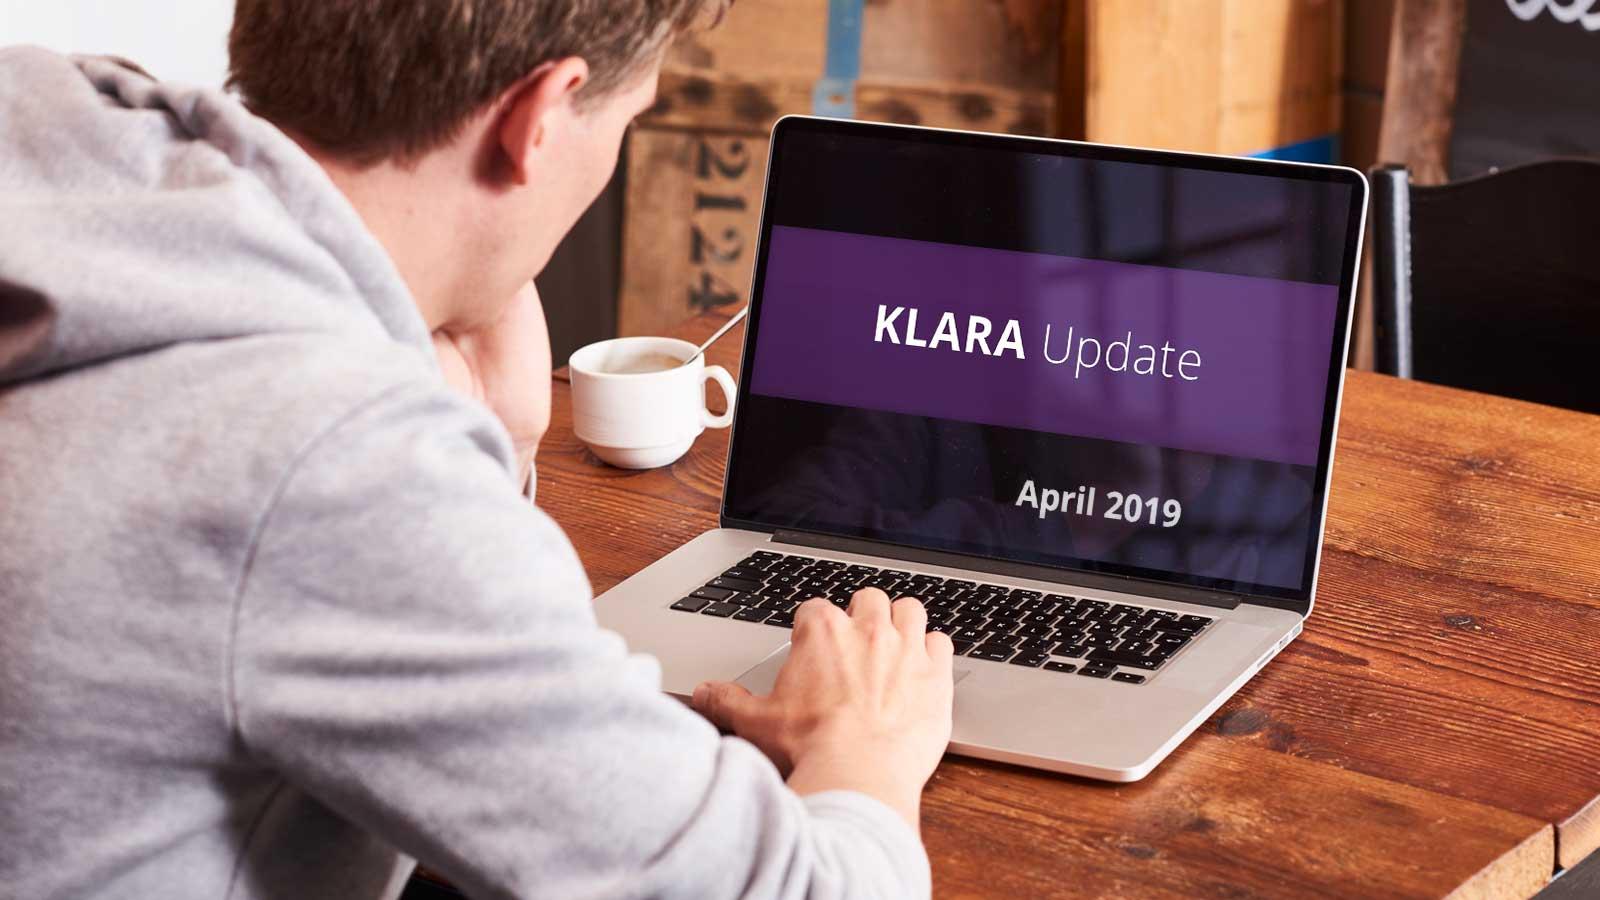 klara_update_april_2019